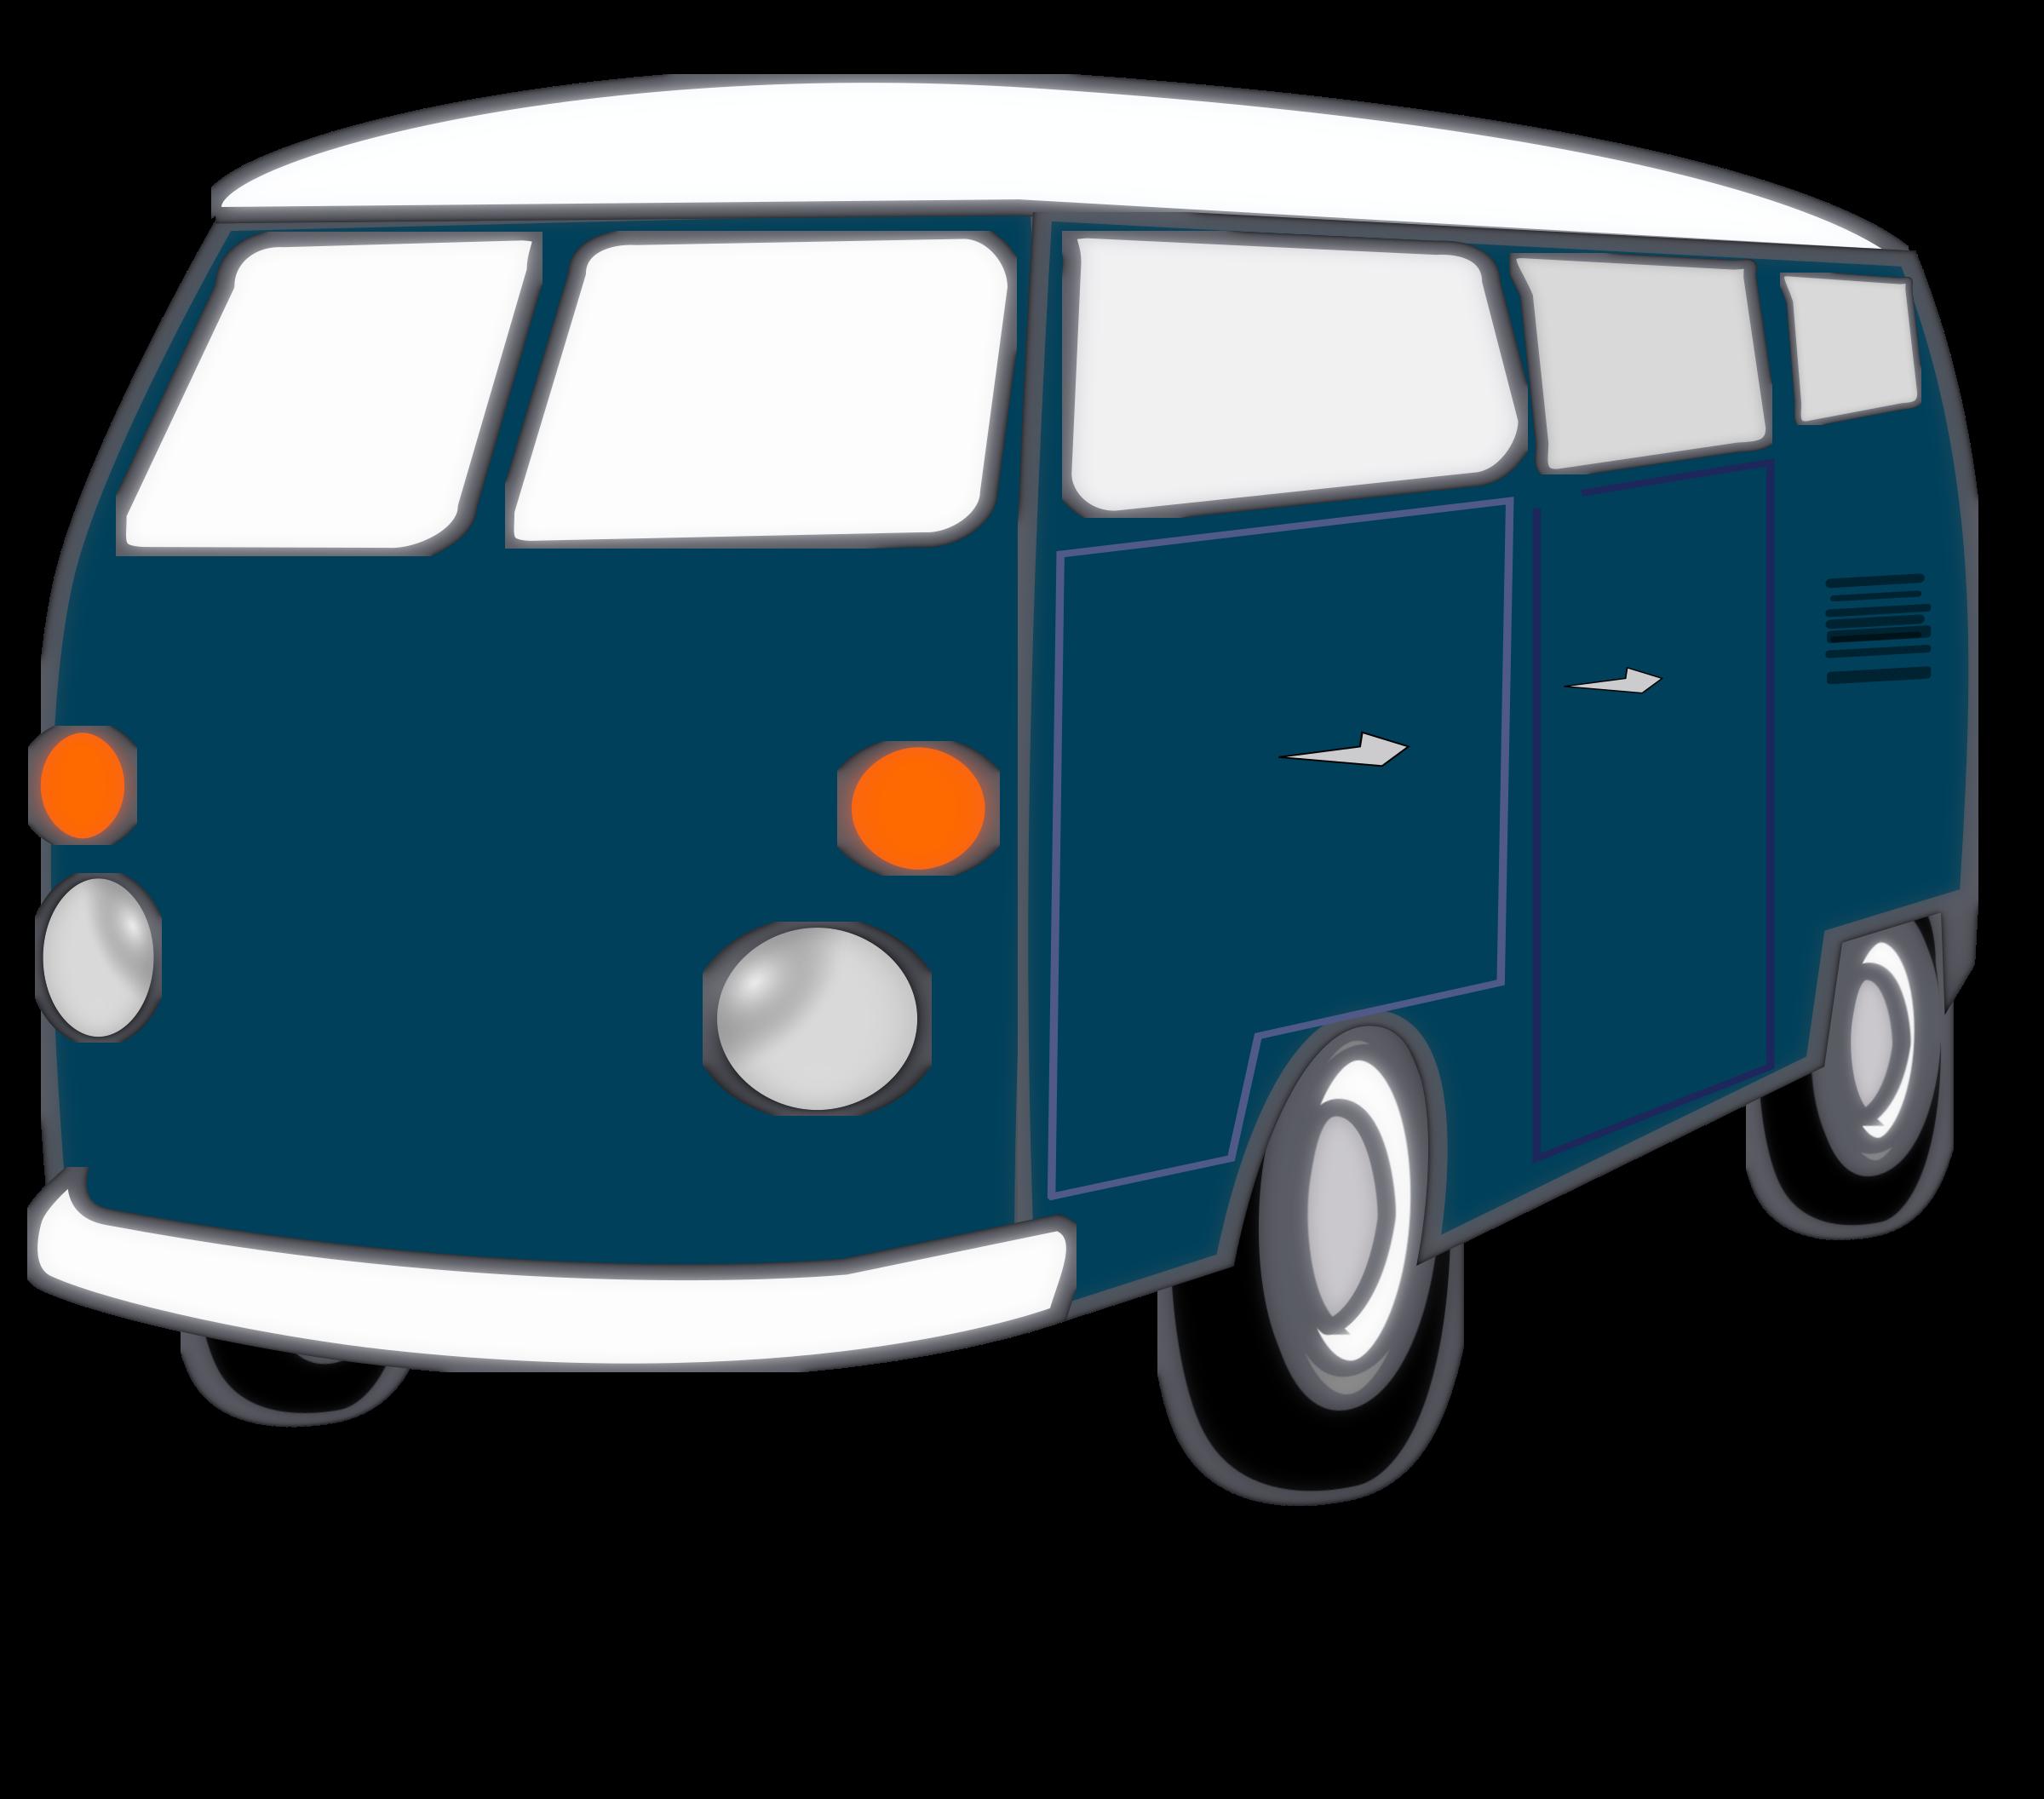 Van Clipart Van Clipart-Van Clipart Van Clipart-16